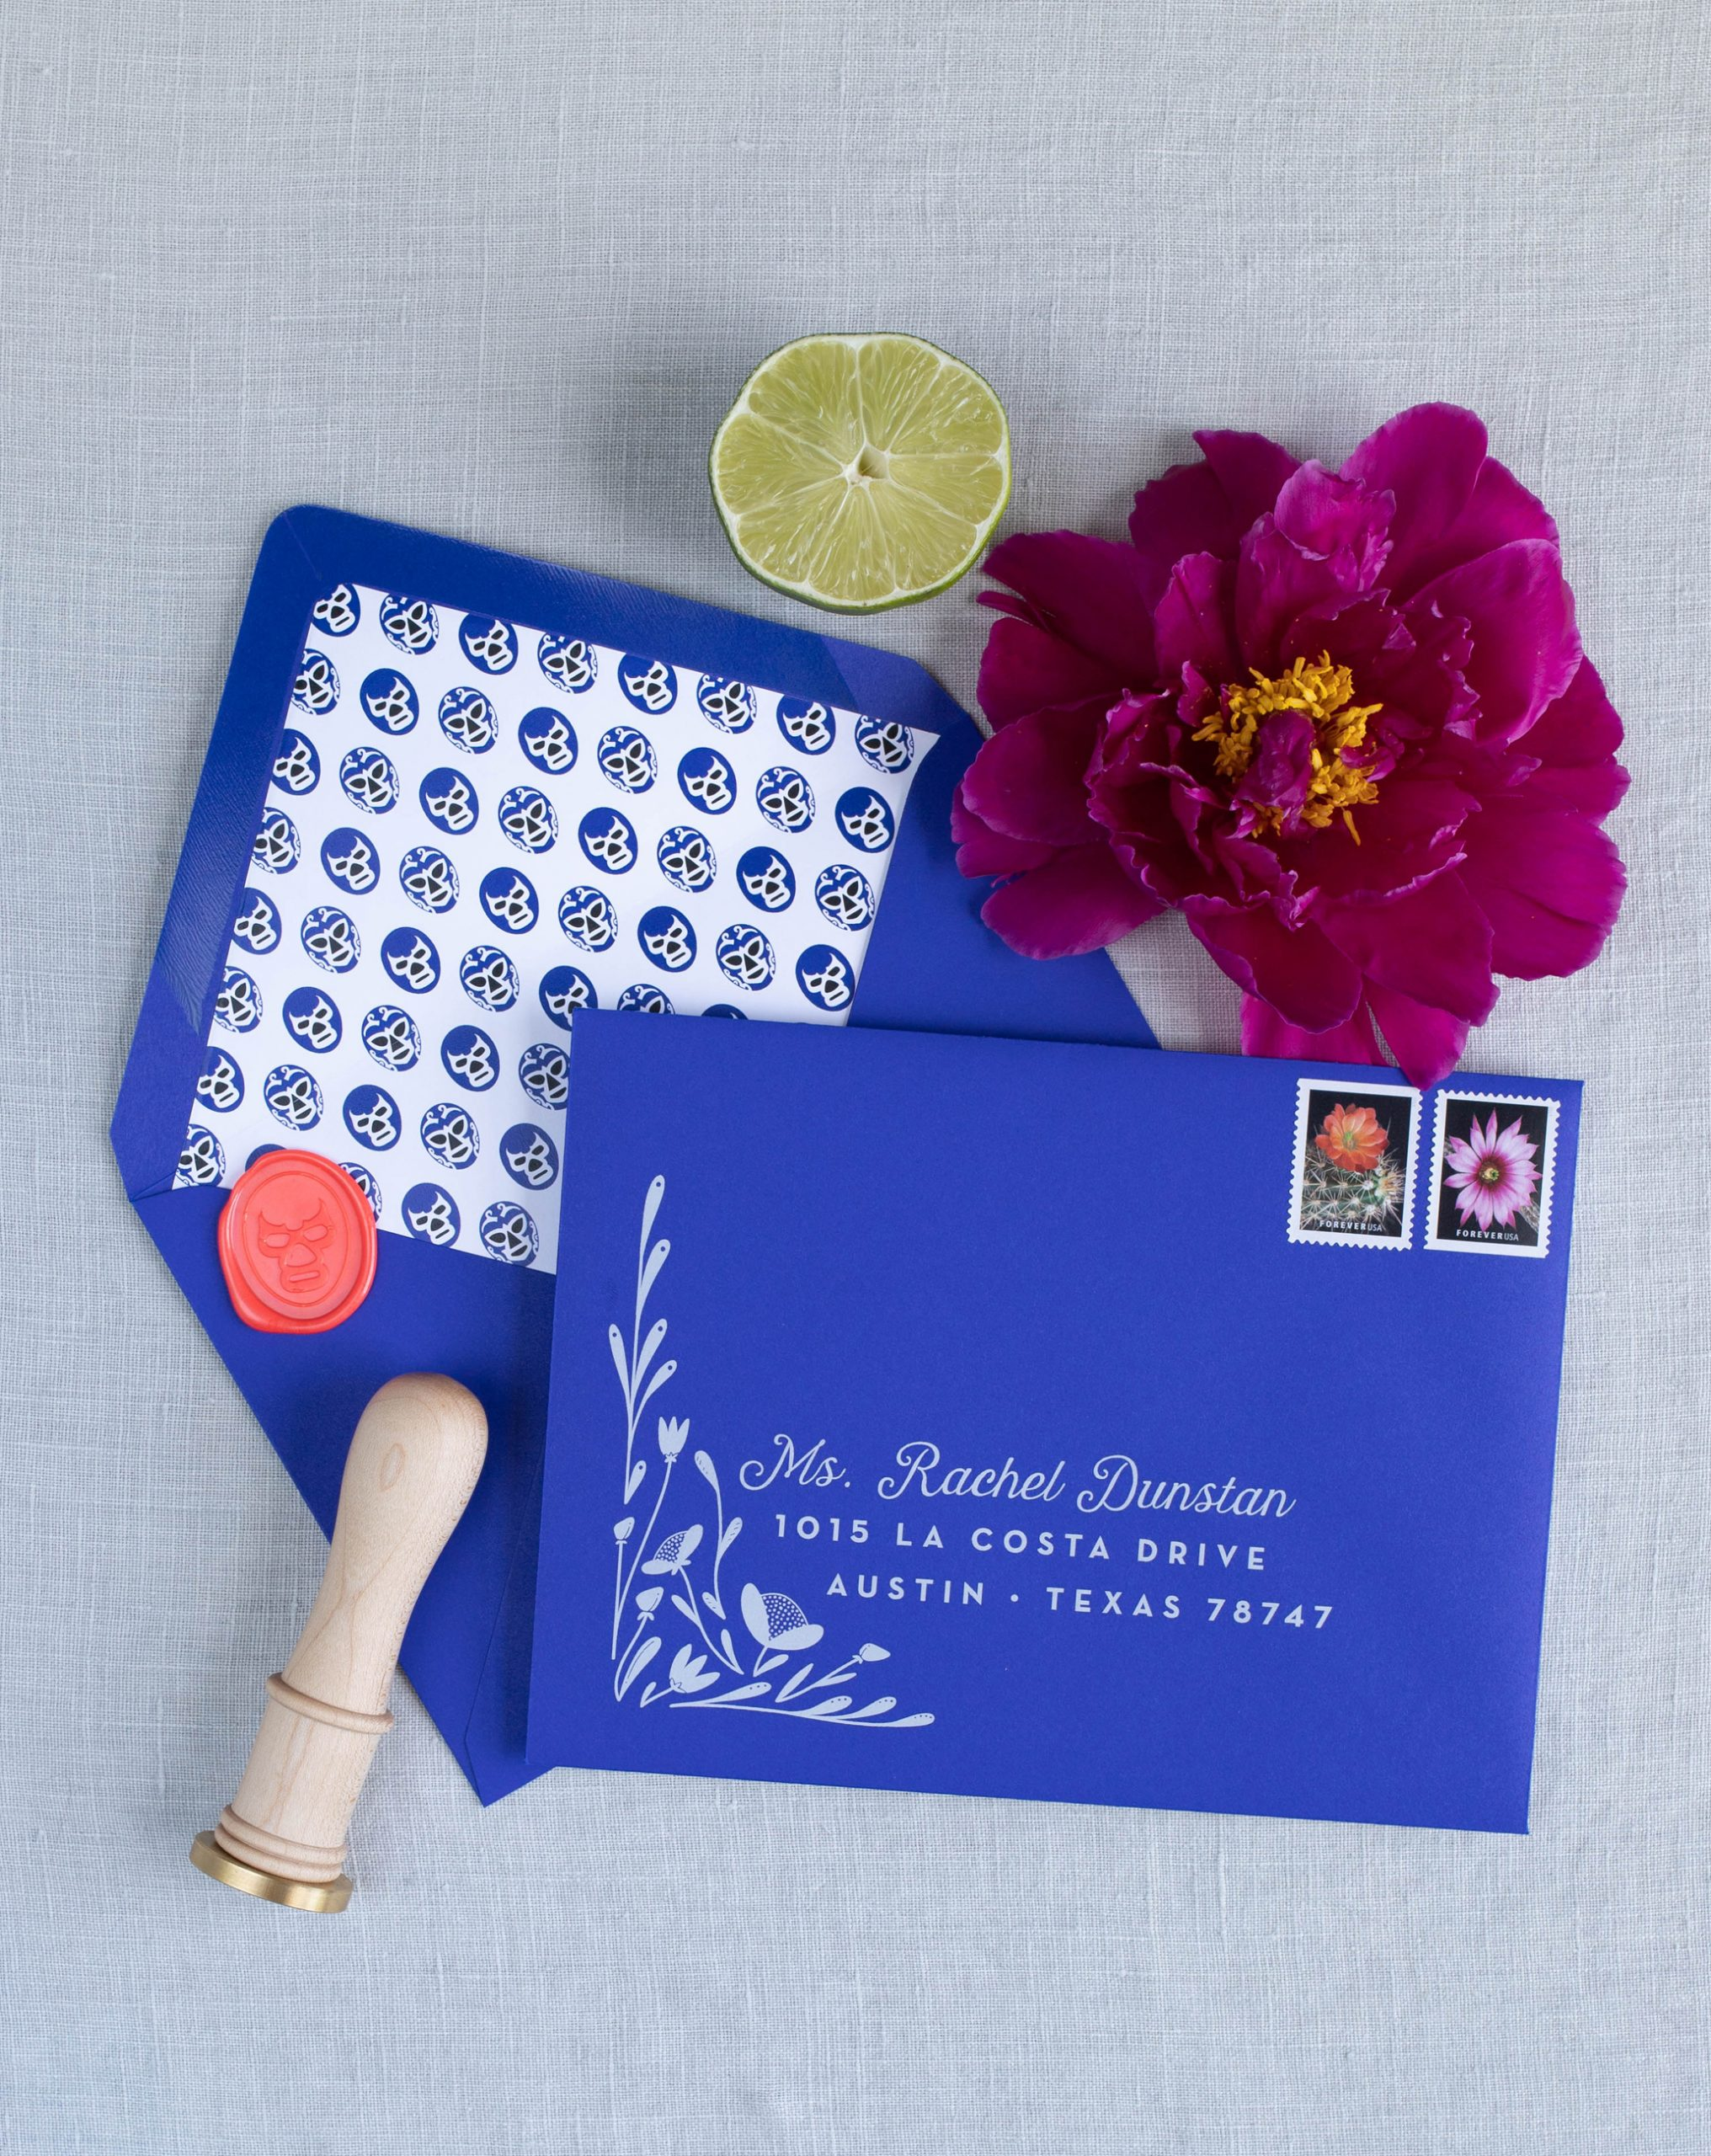 fun modern wedding invitations with illustrated envelope liner, super fun and original